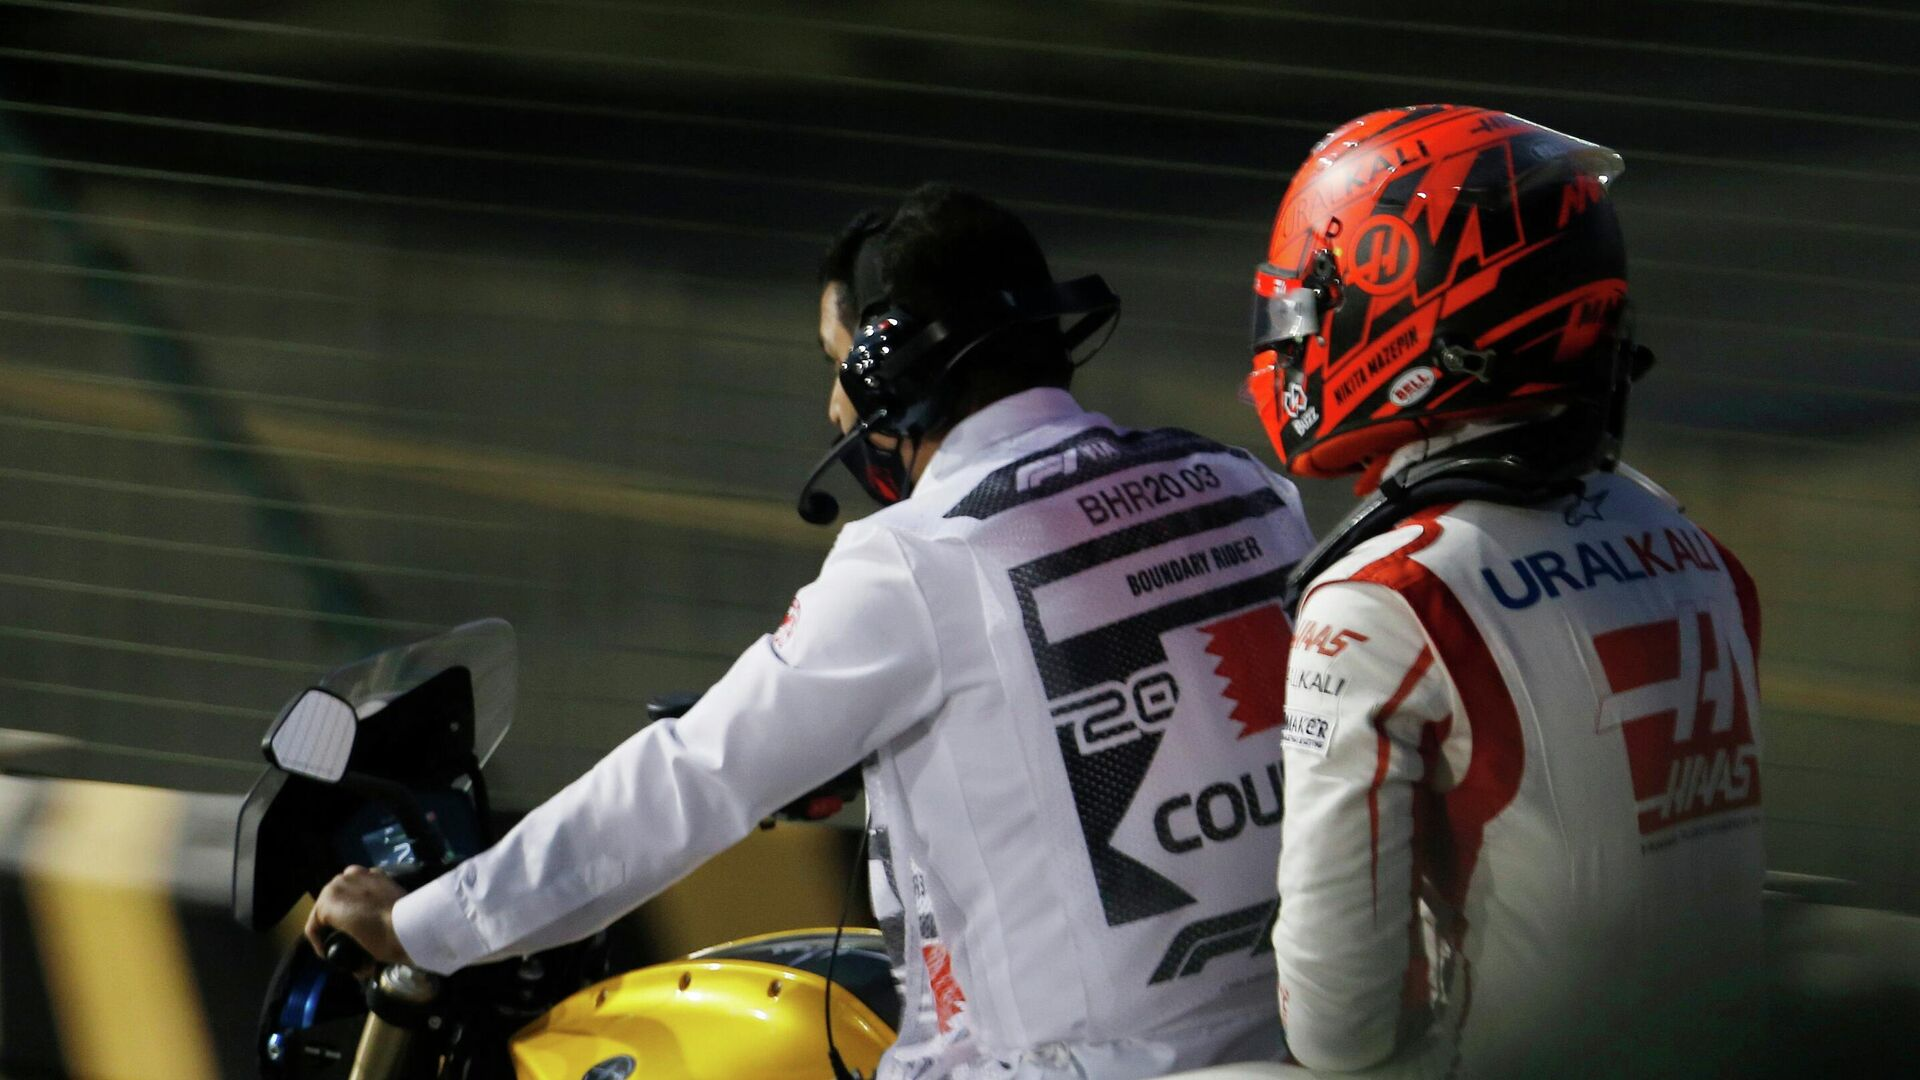 Никита Мазепин после аварии на Гран-при Бахрейна Формулы-1 - РИА Новости, 1920, 28.03.2021